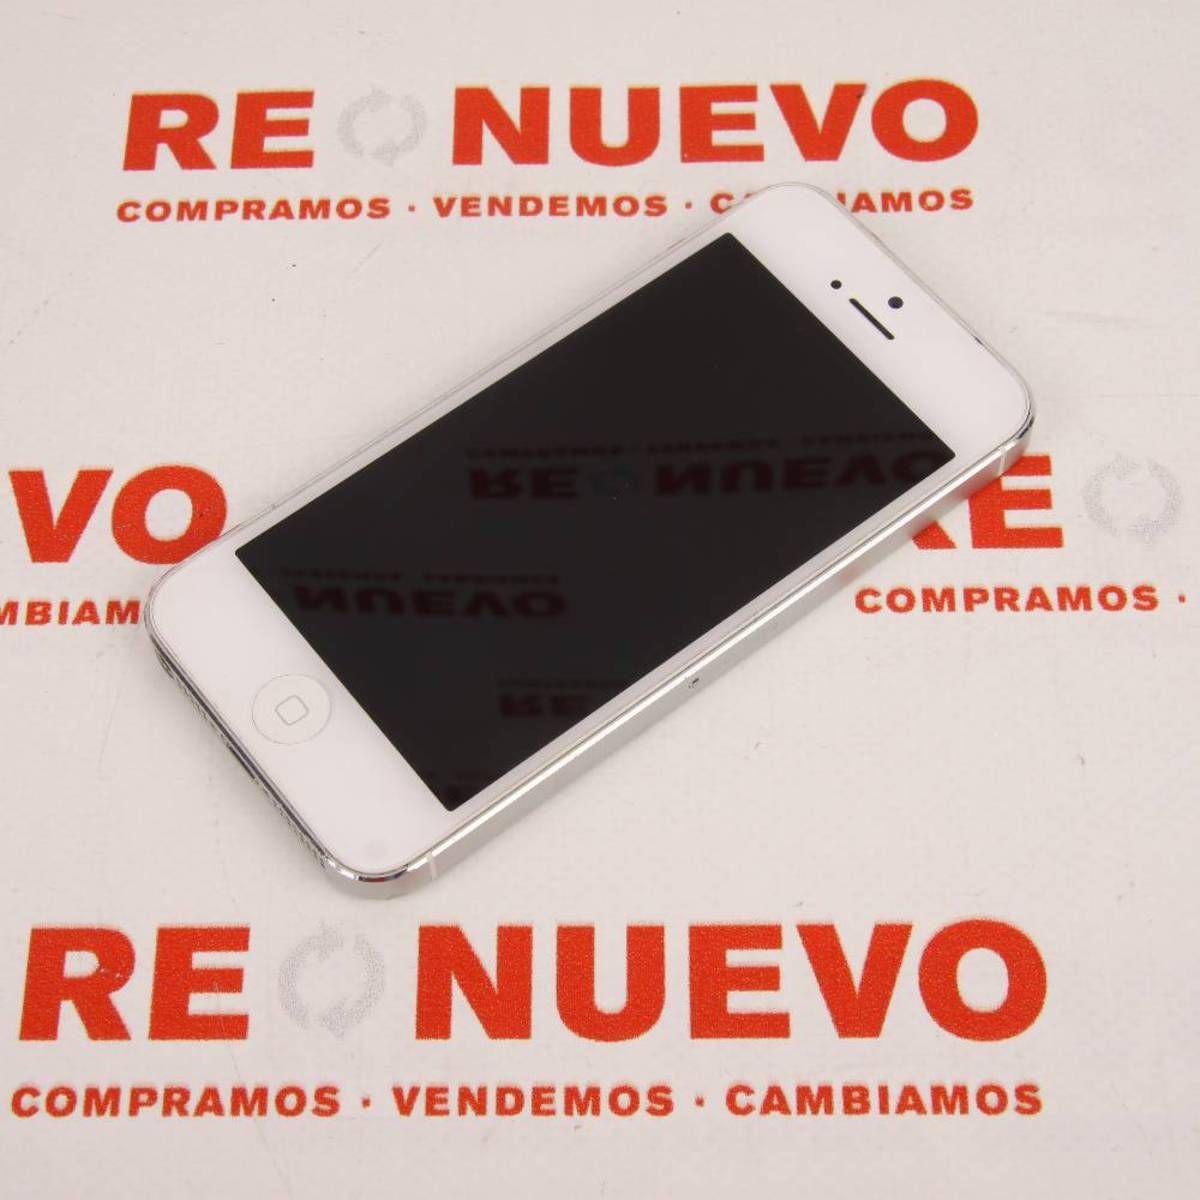 65b1a0a05f9 #iPHONE 5 #Vodafone #16GB E268109 de segunda mano | Tienda online de segunda